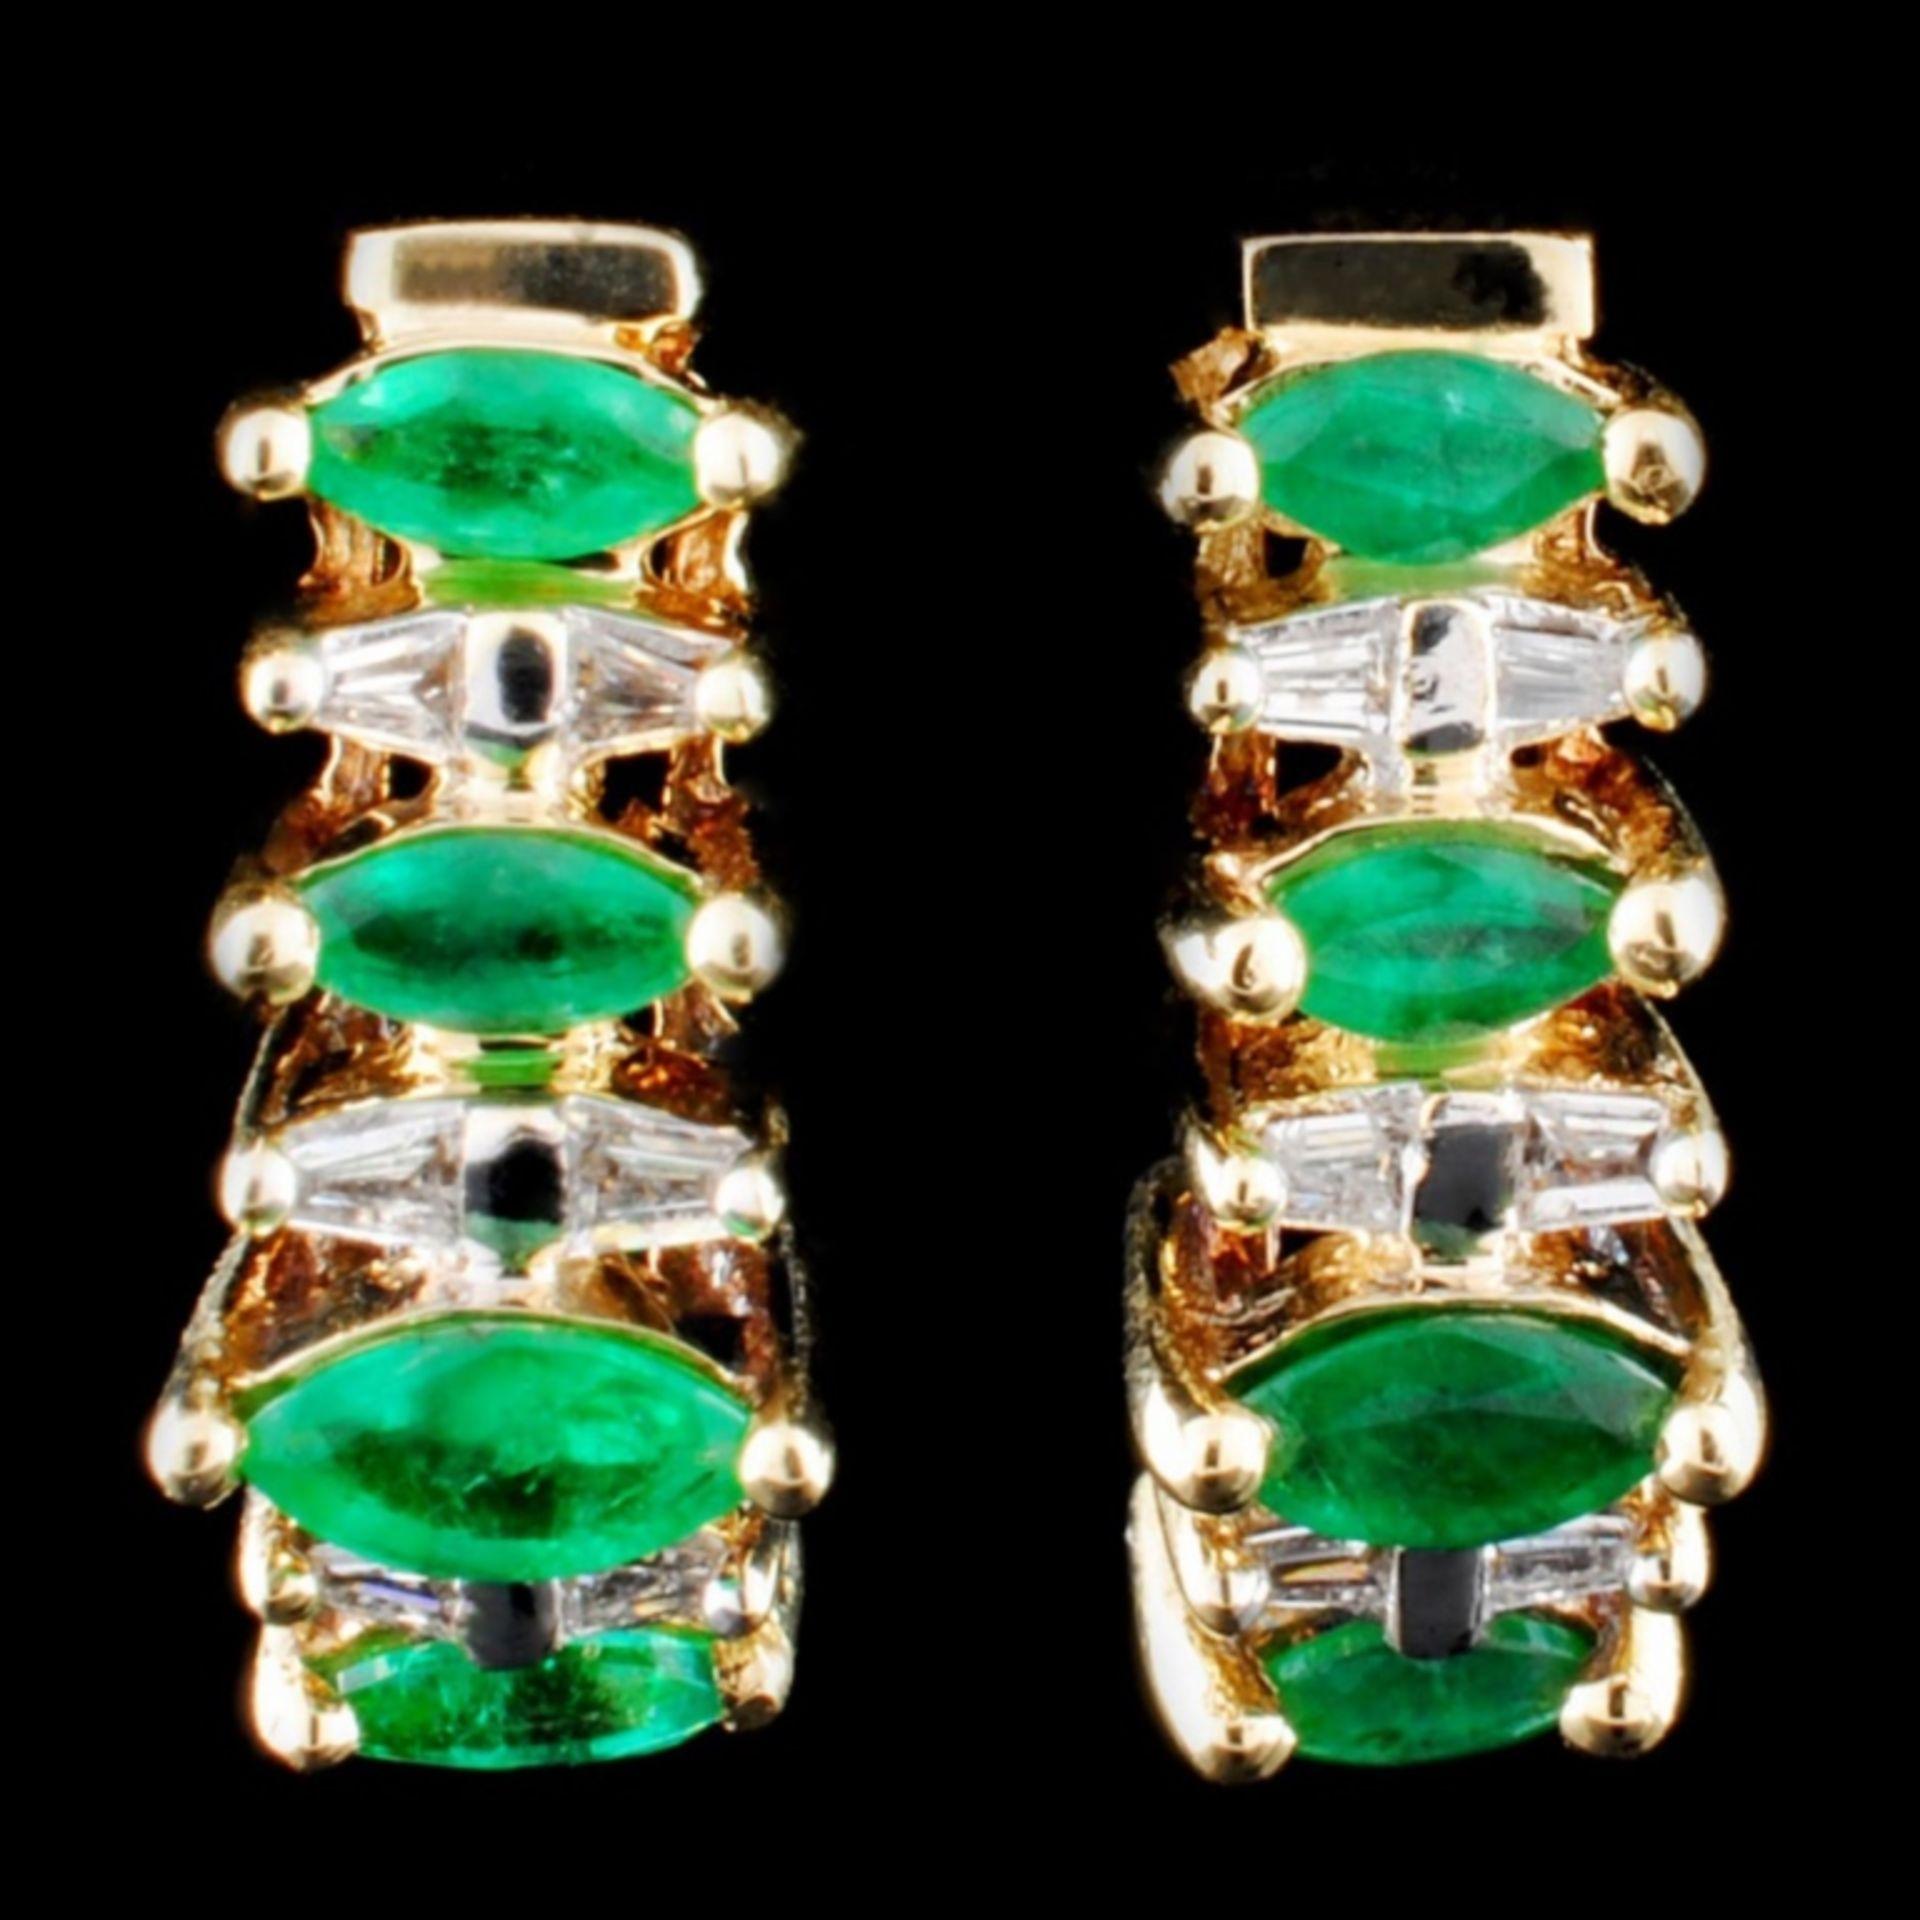 14K Gold 0.46ct Emerald & 0.22ct Diamond Earrings - Image 2 of 3